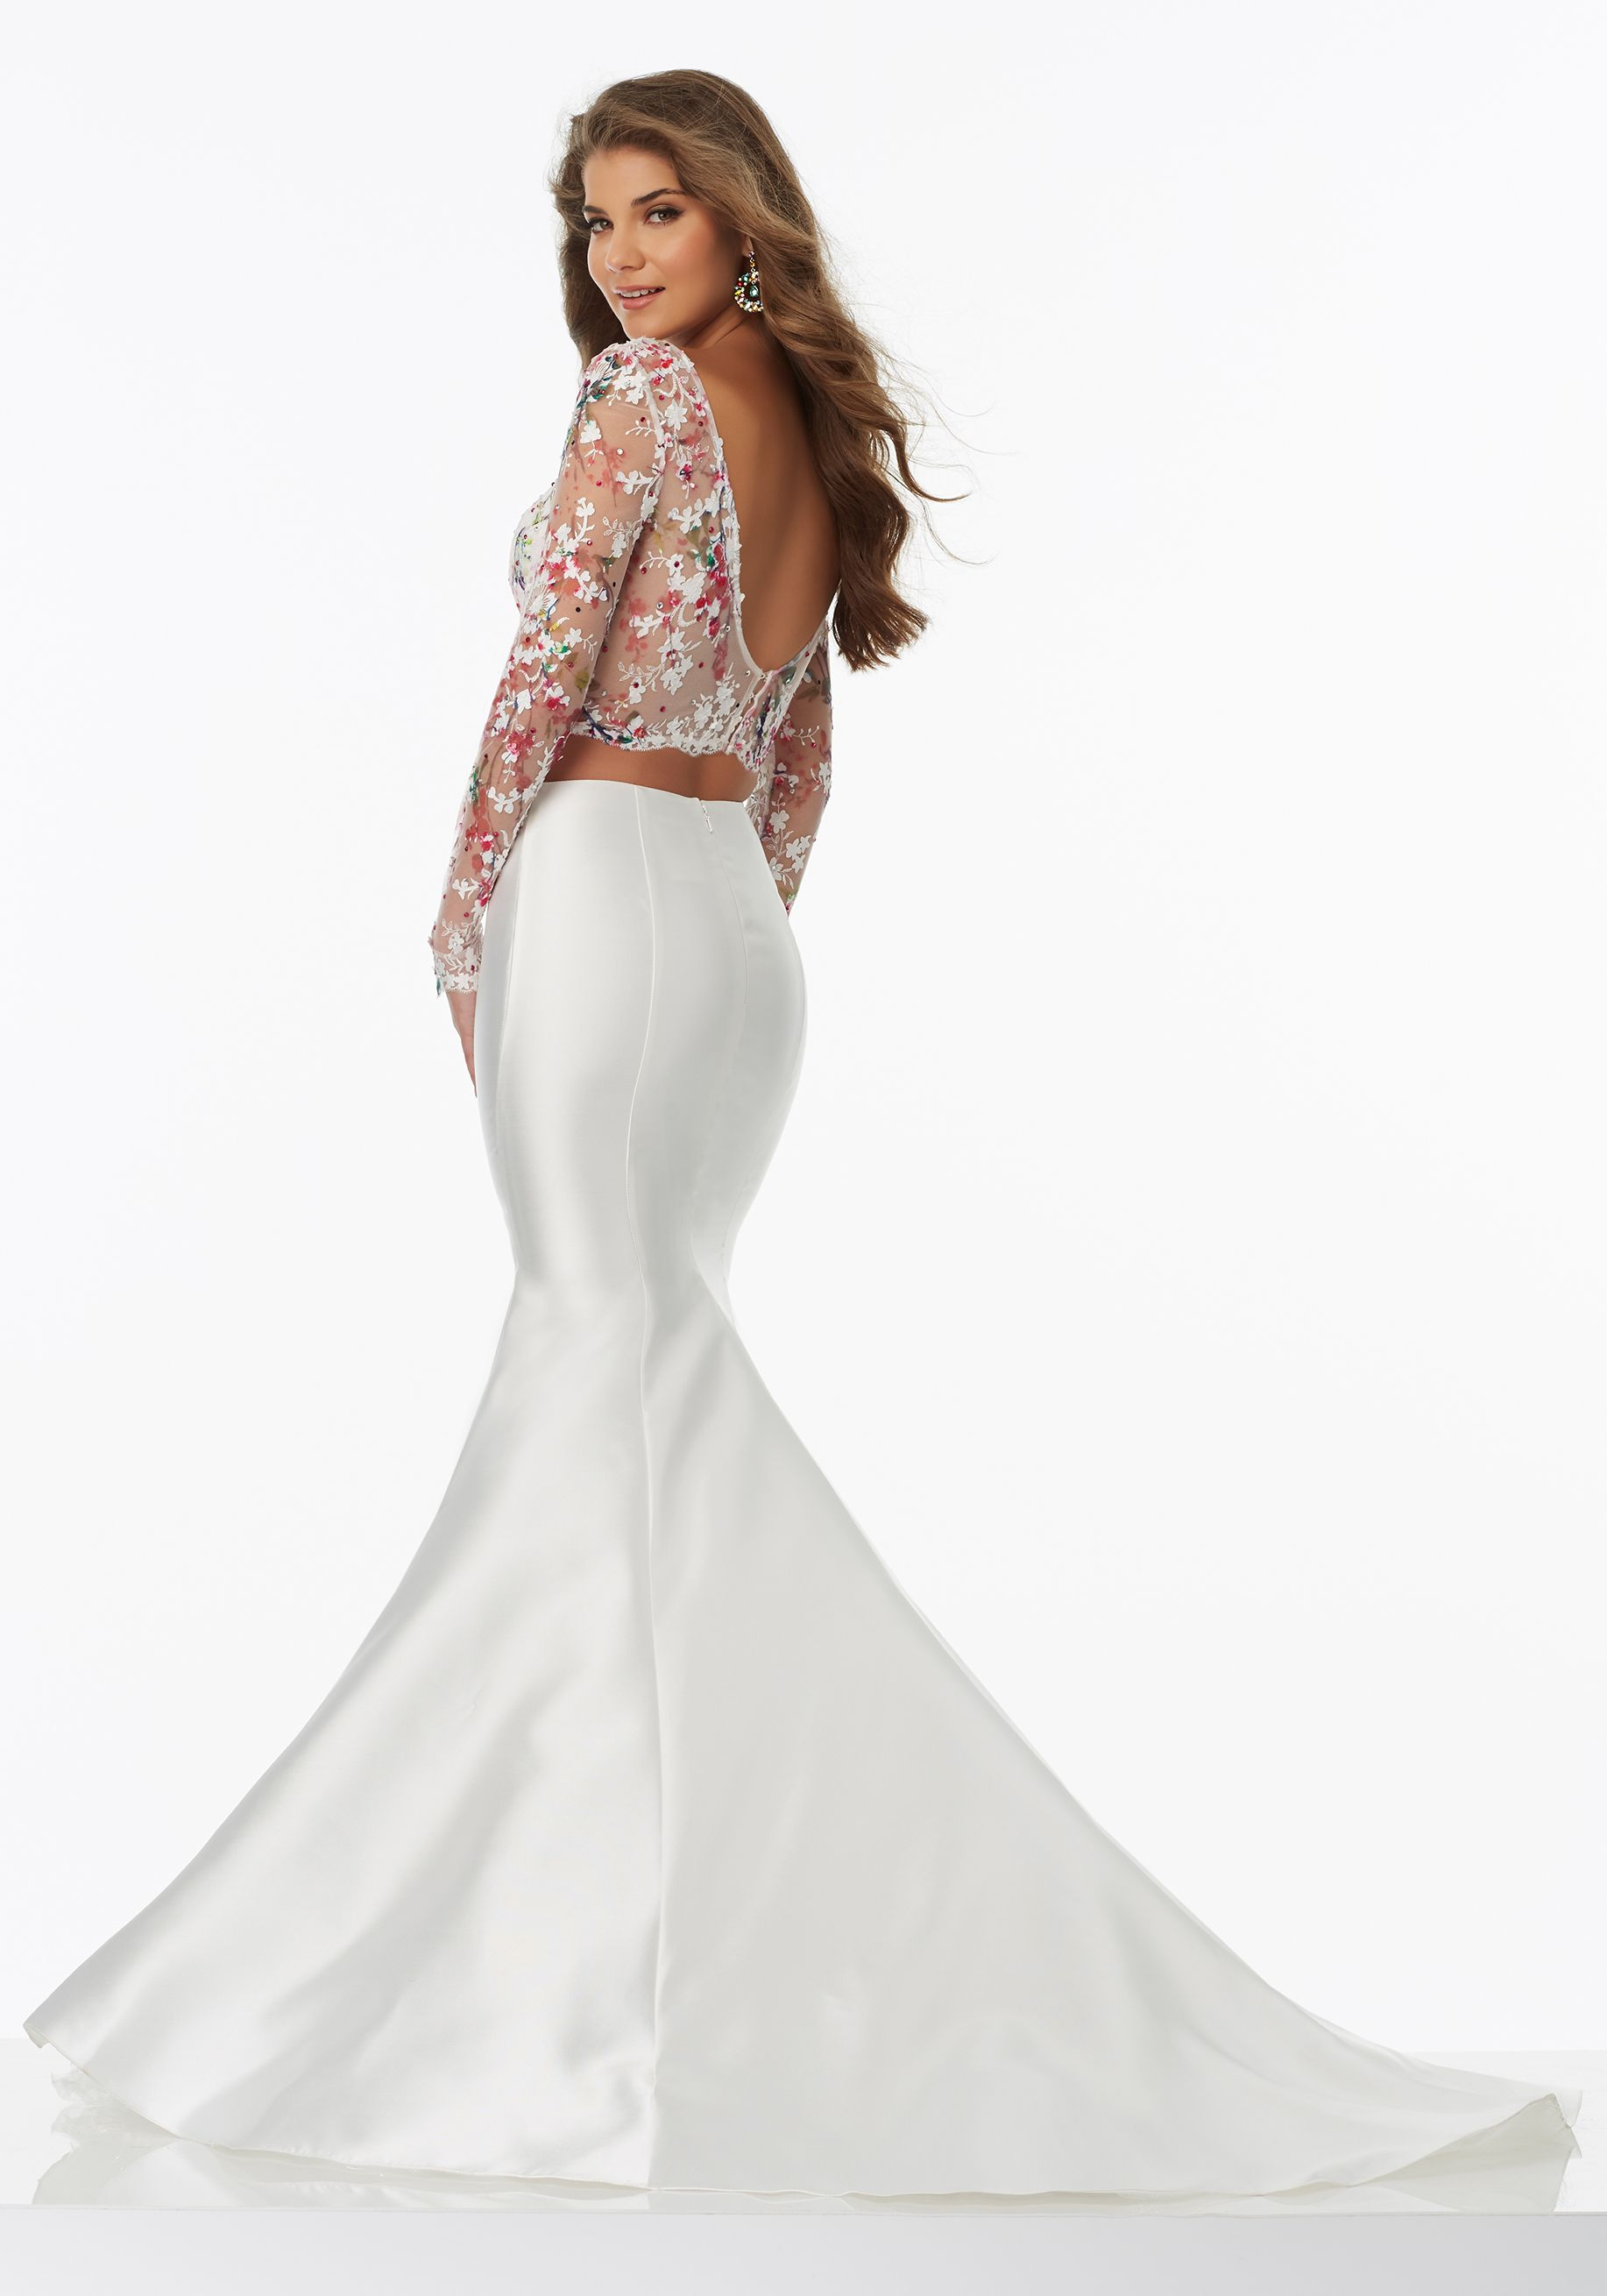 Twopiece prom dress with larissa satin mermaids skirt net top